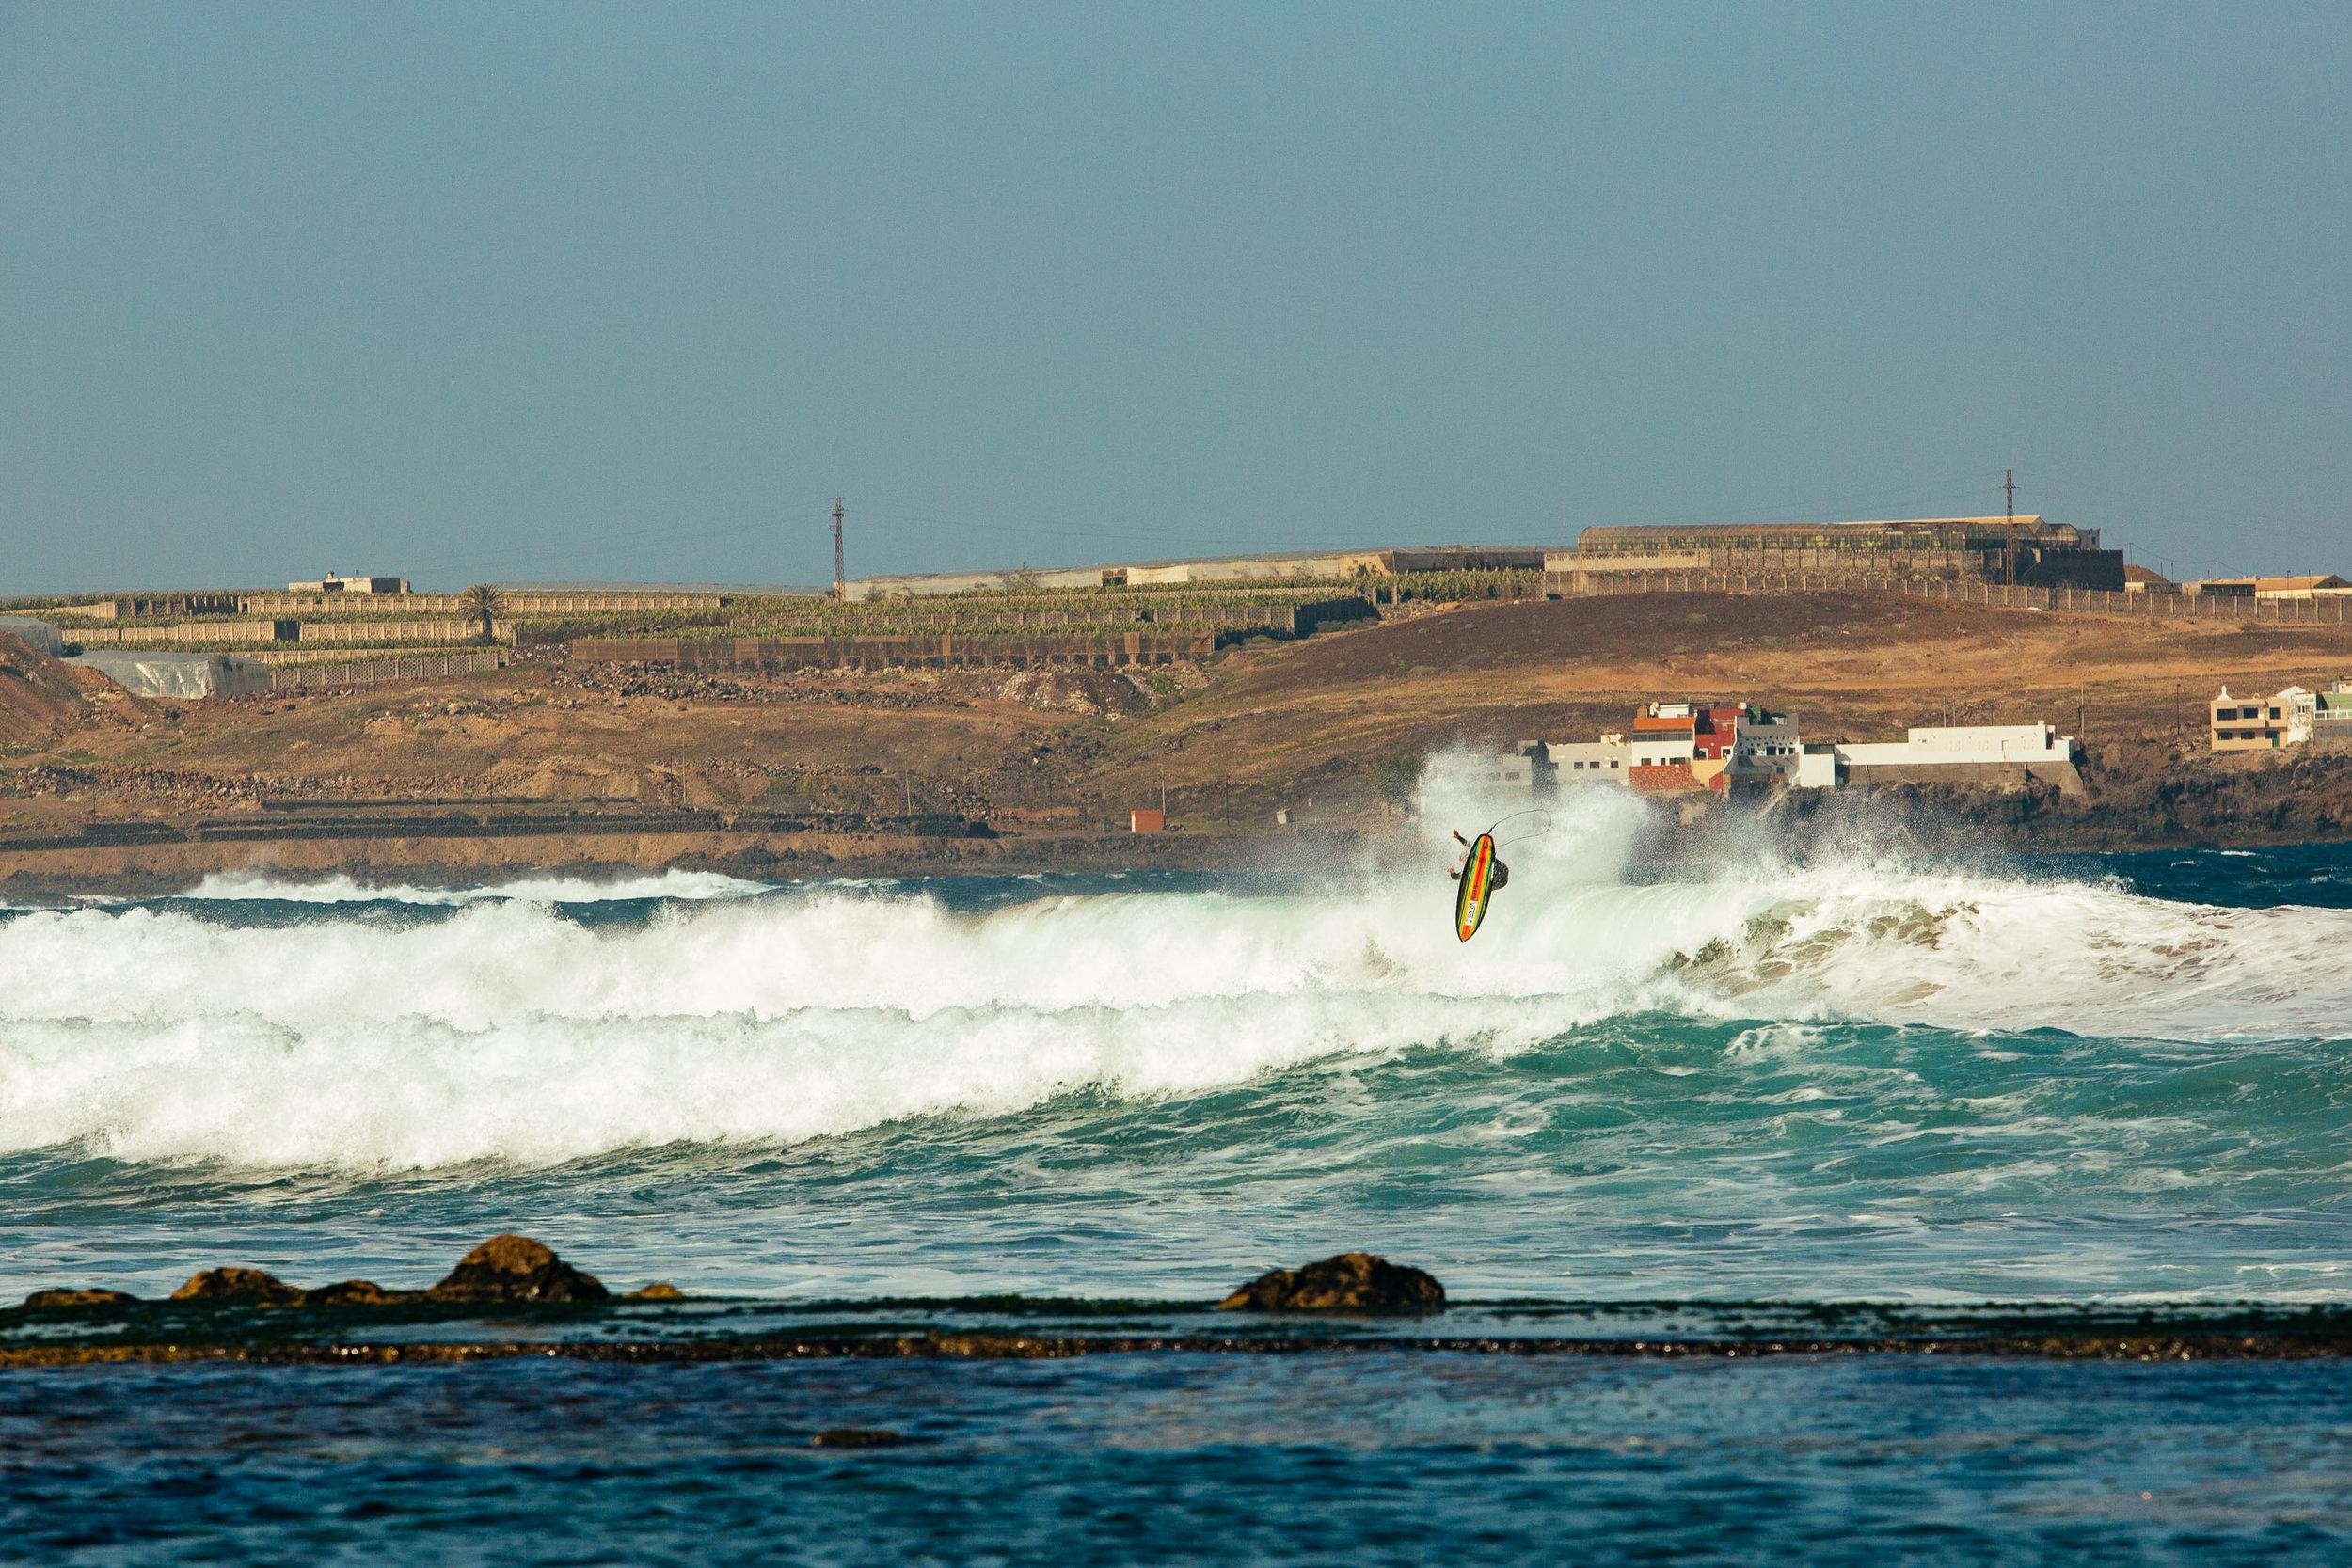 Seb_Gran_Canaria-11.jpg